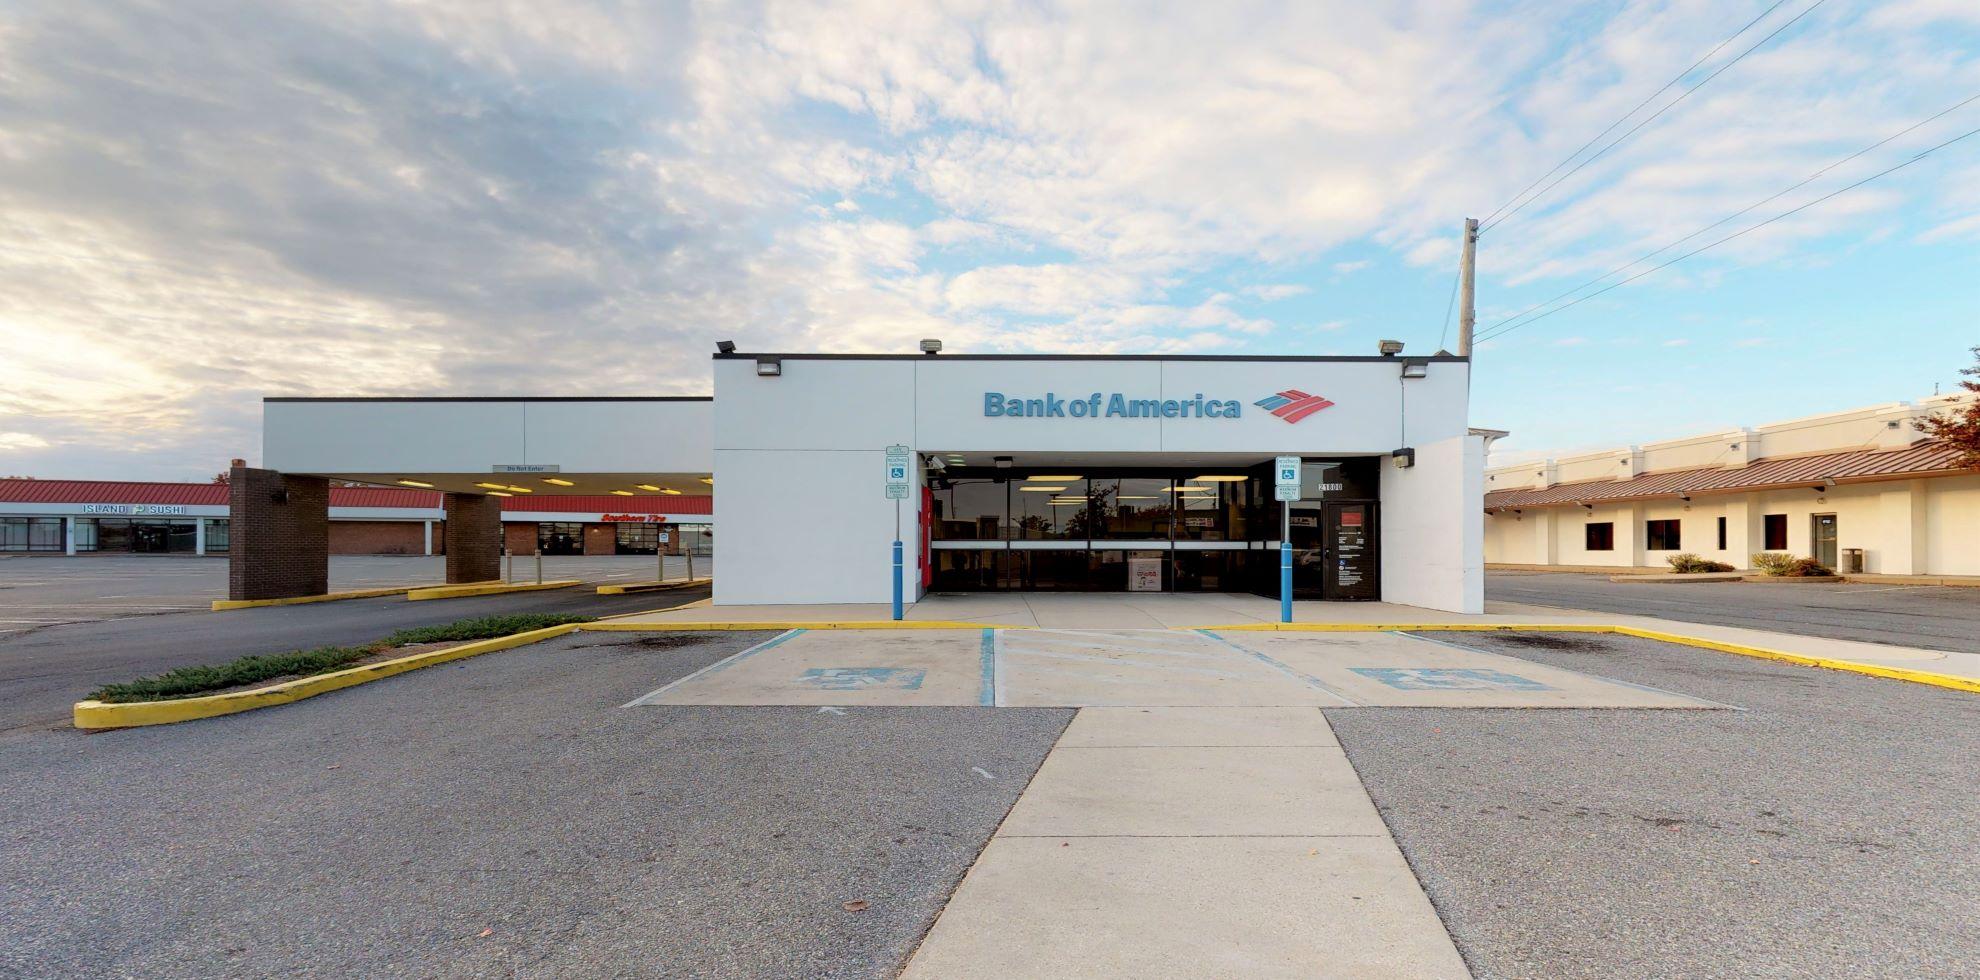 Bank of America financial center with drive-thru ATM | 21800 N Shangri La Dr Unit 22, Lexington Park, MD 20653